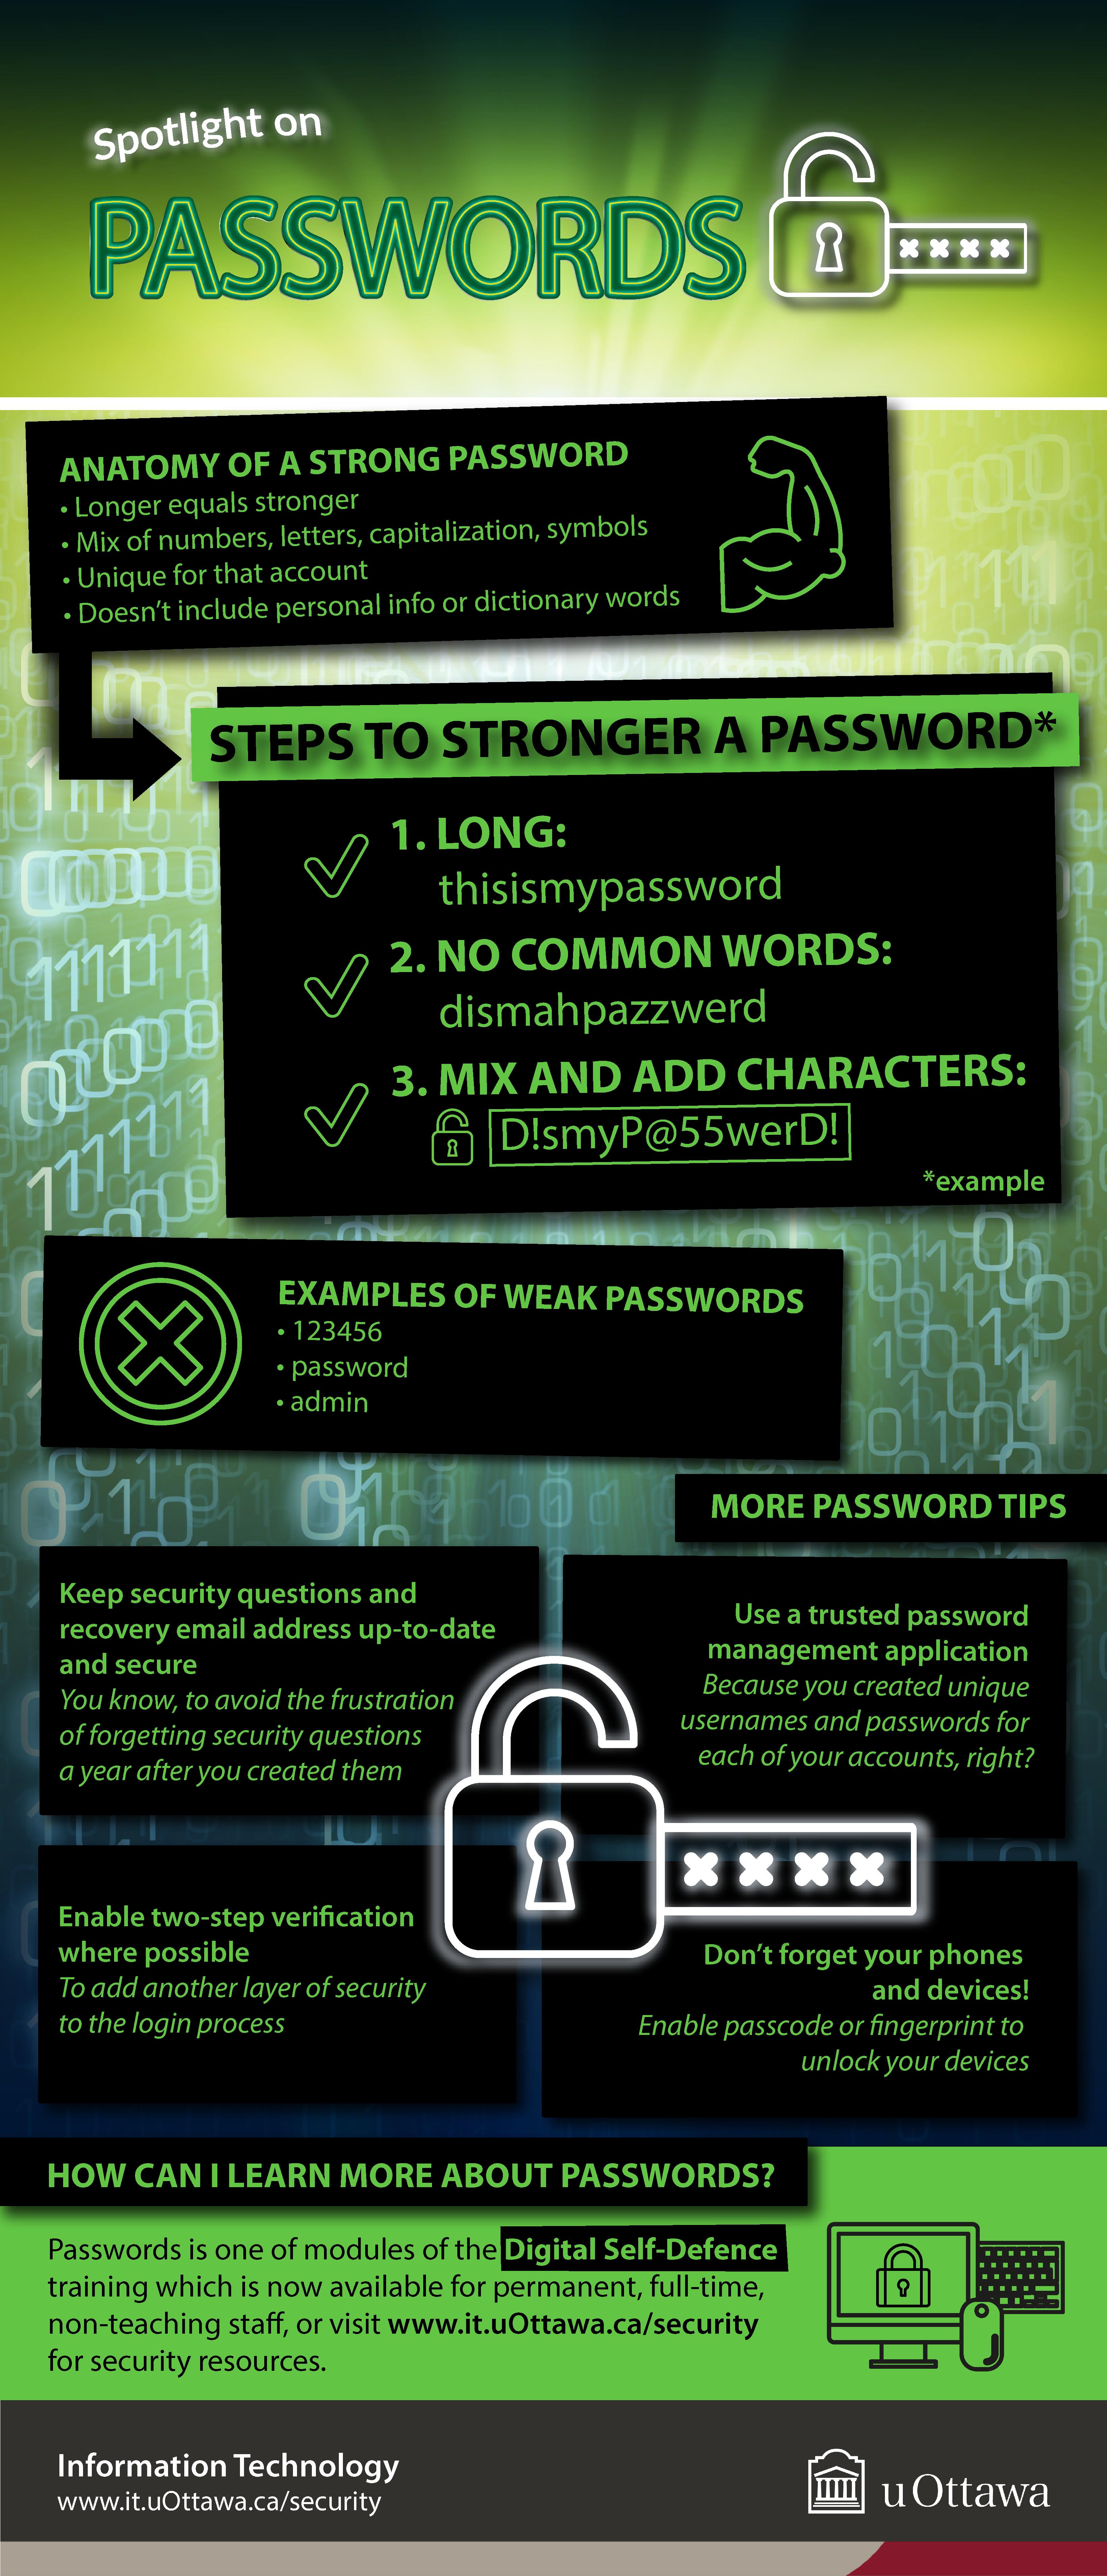 Spotlight on passwords, infographic